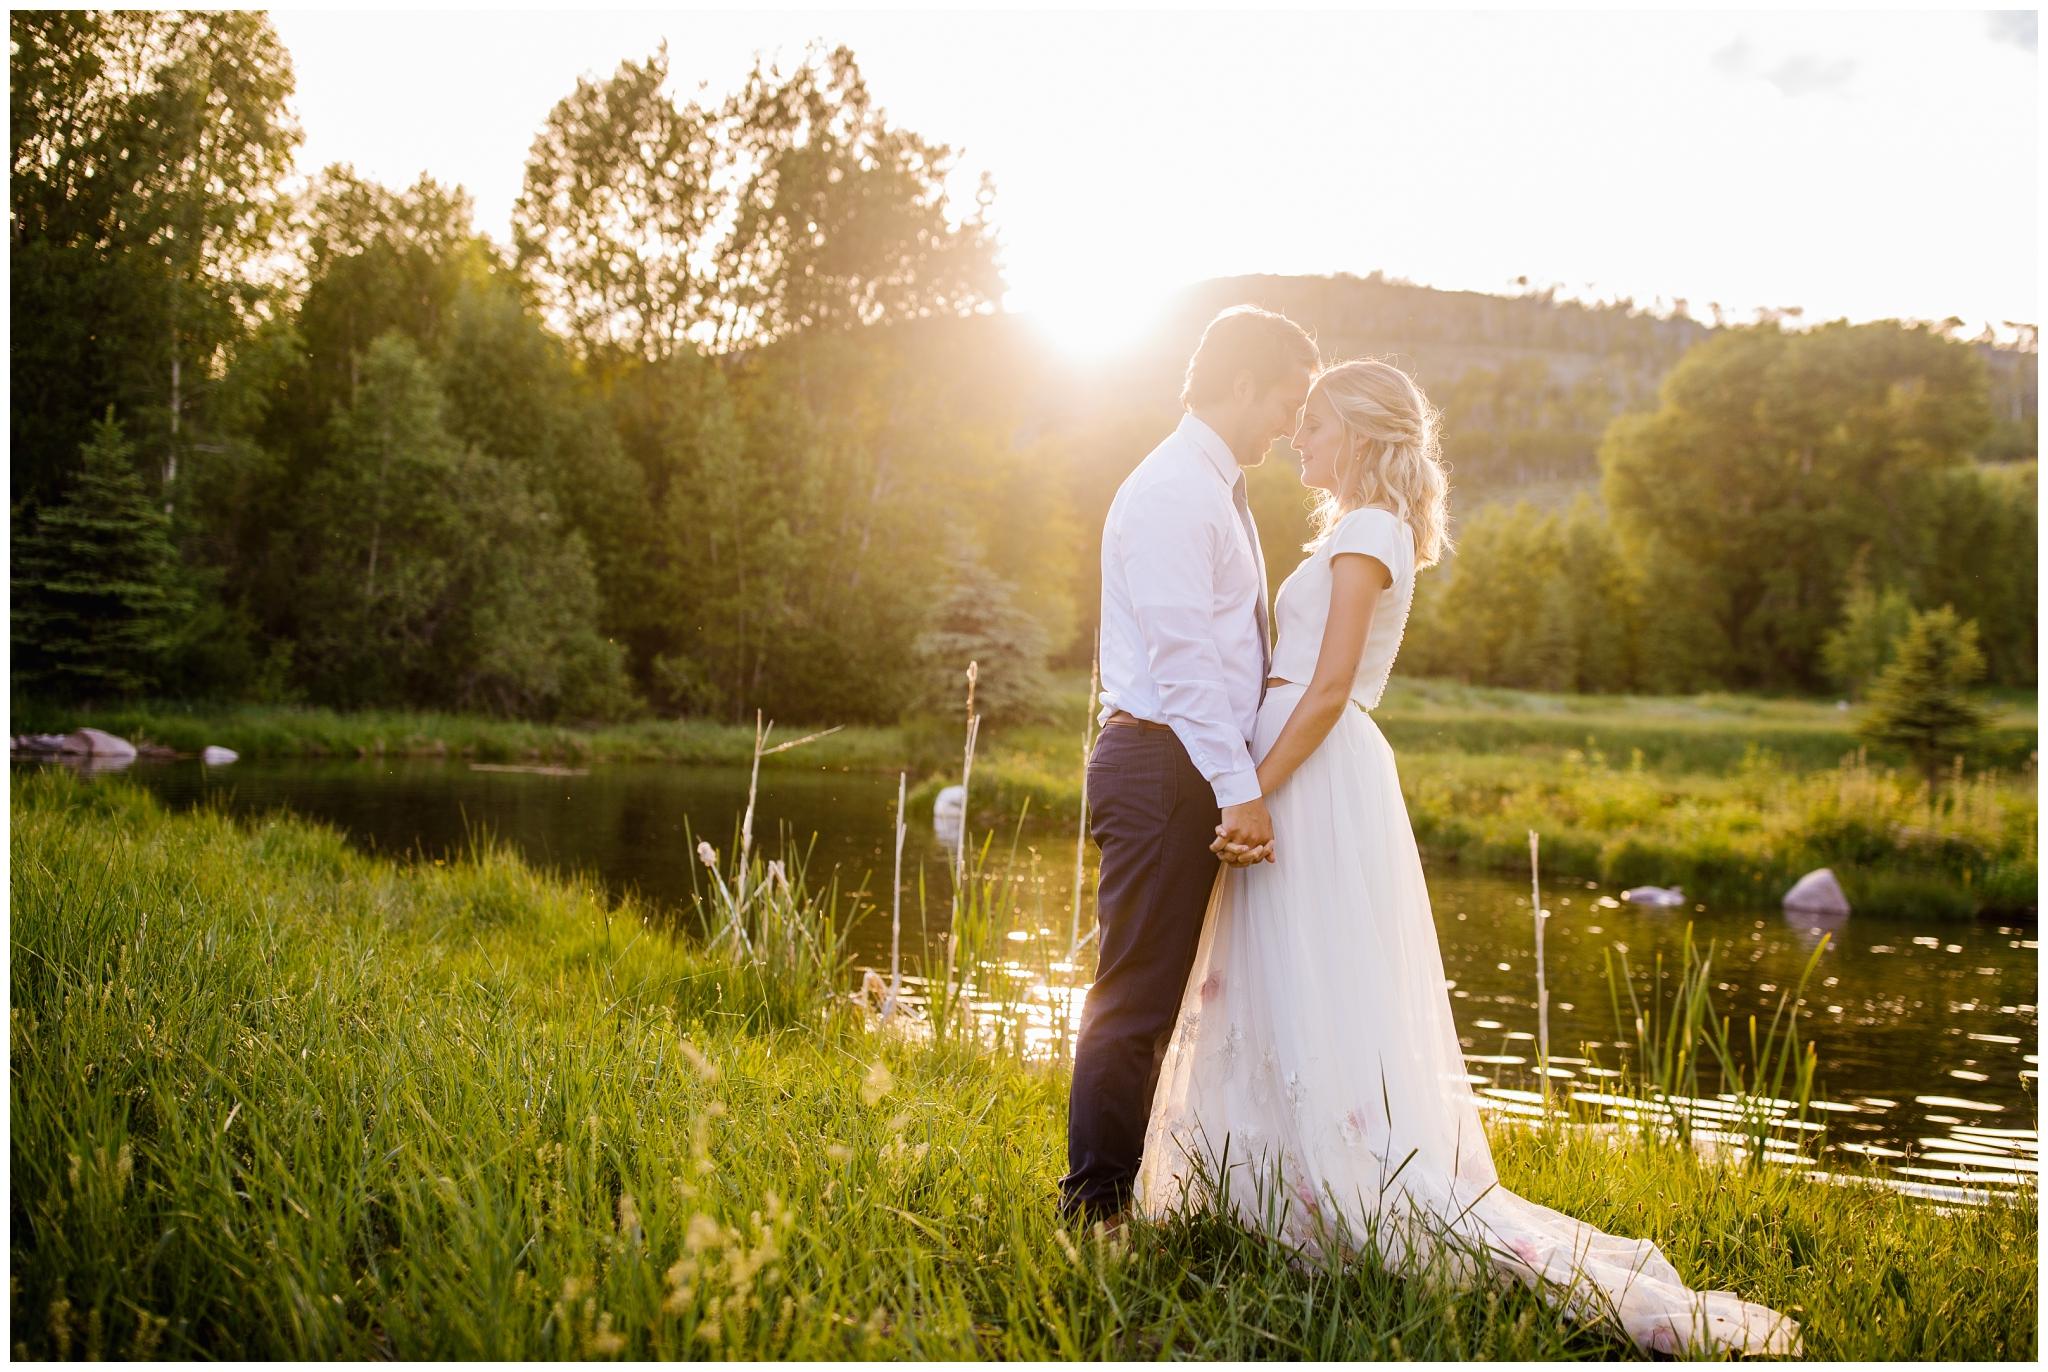 Lizzie-B-Imagery-Utah-Wedding-Photographer-Park-City-Photographer_0063.jpg